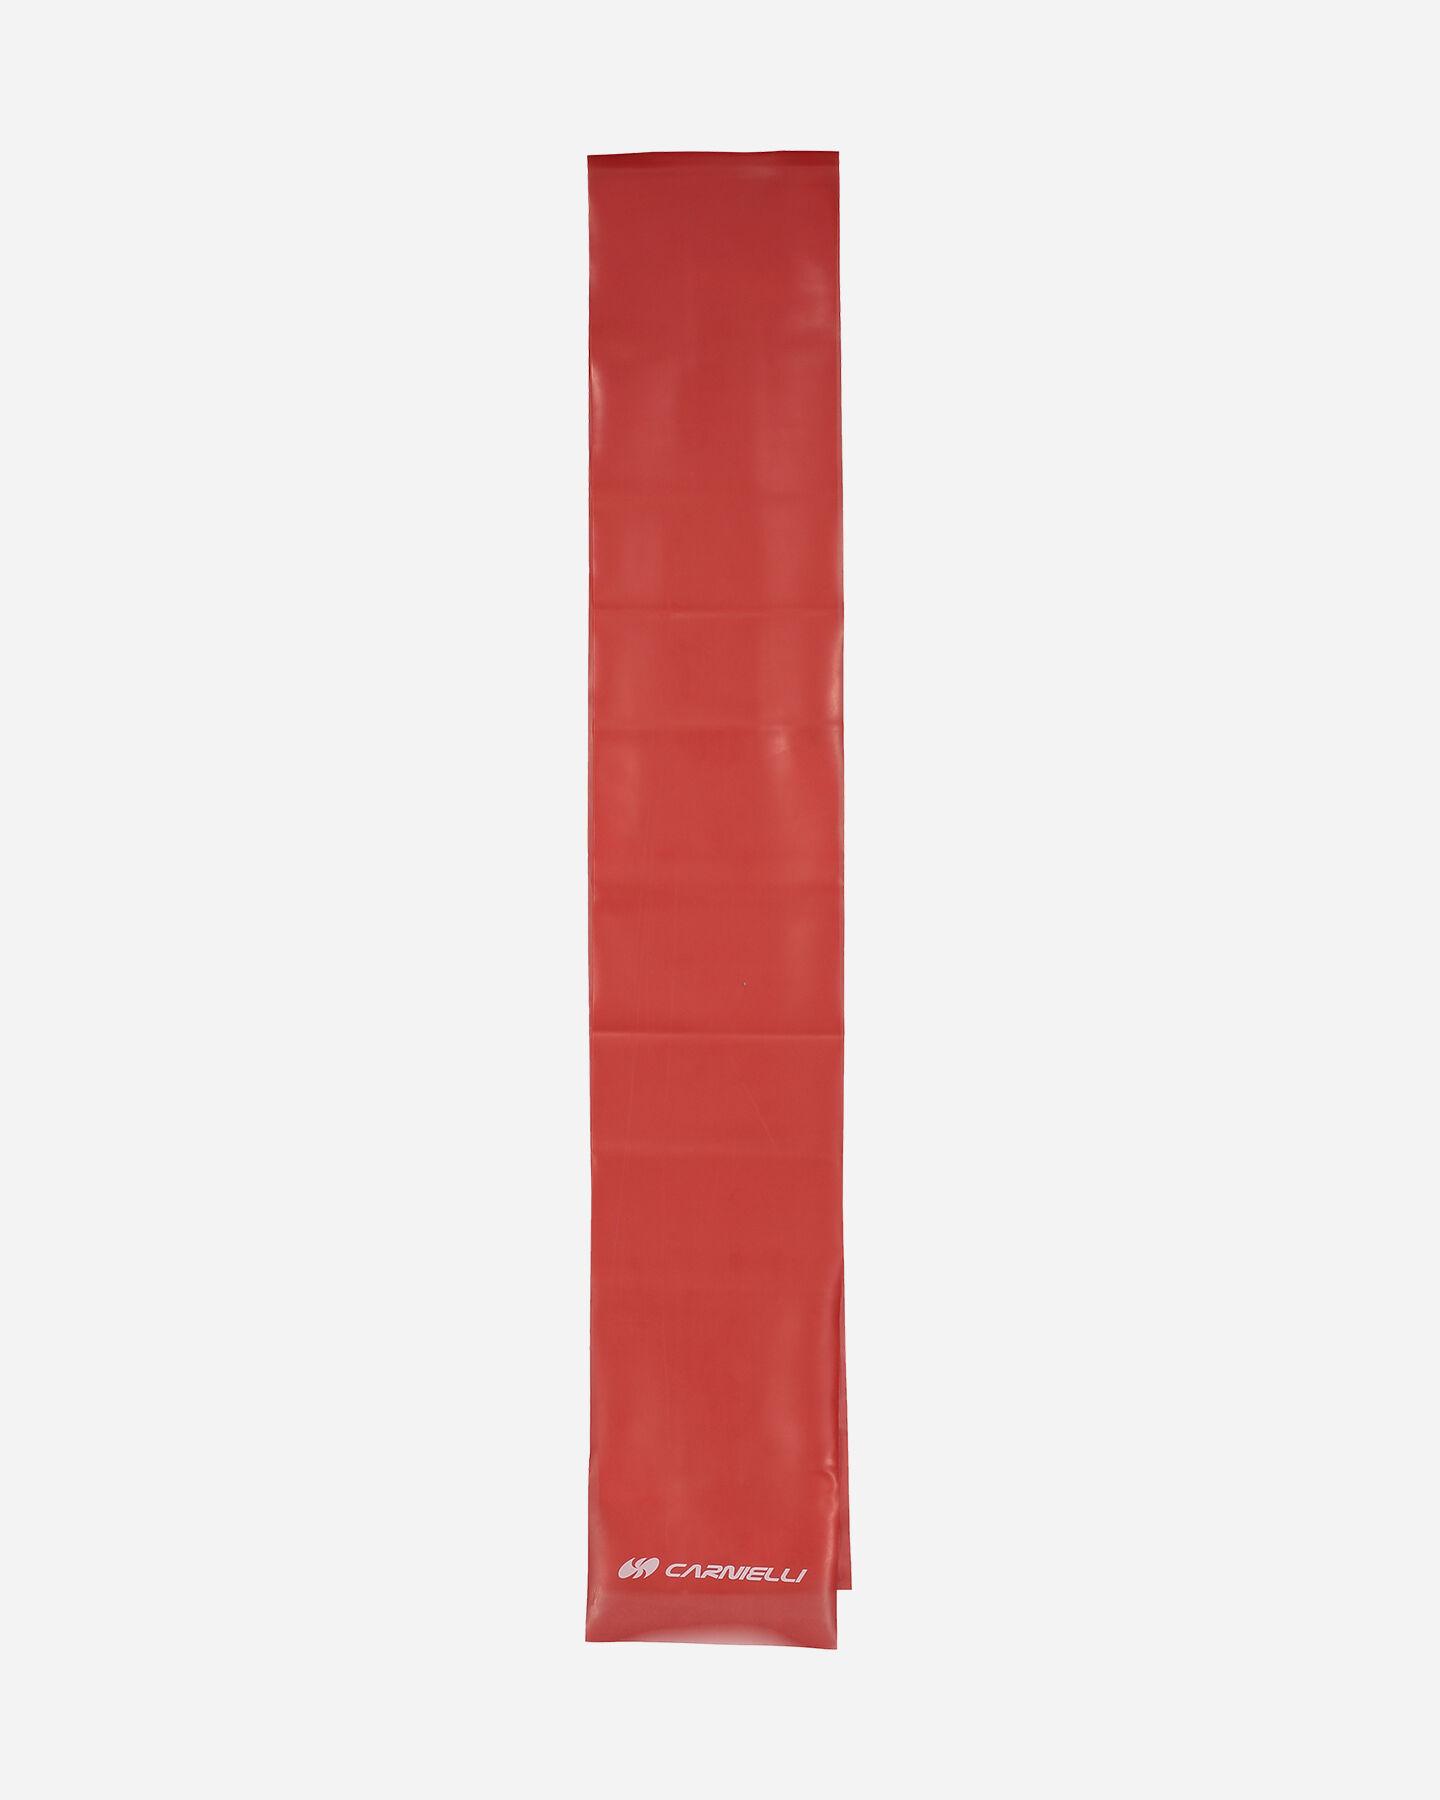 Banda elastica CARNIELLI BANDA ELASTICA 175 CM S1326894 1 UNI scatto 0